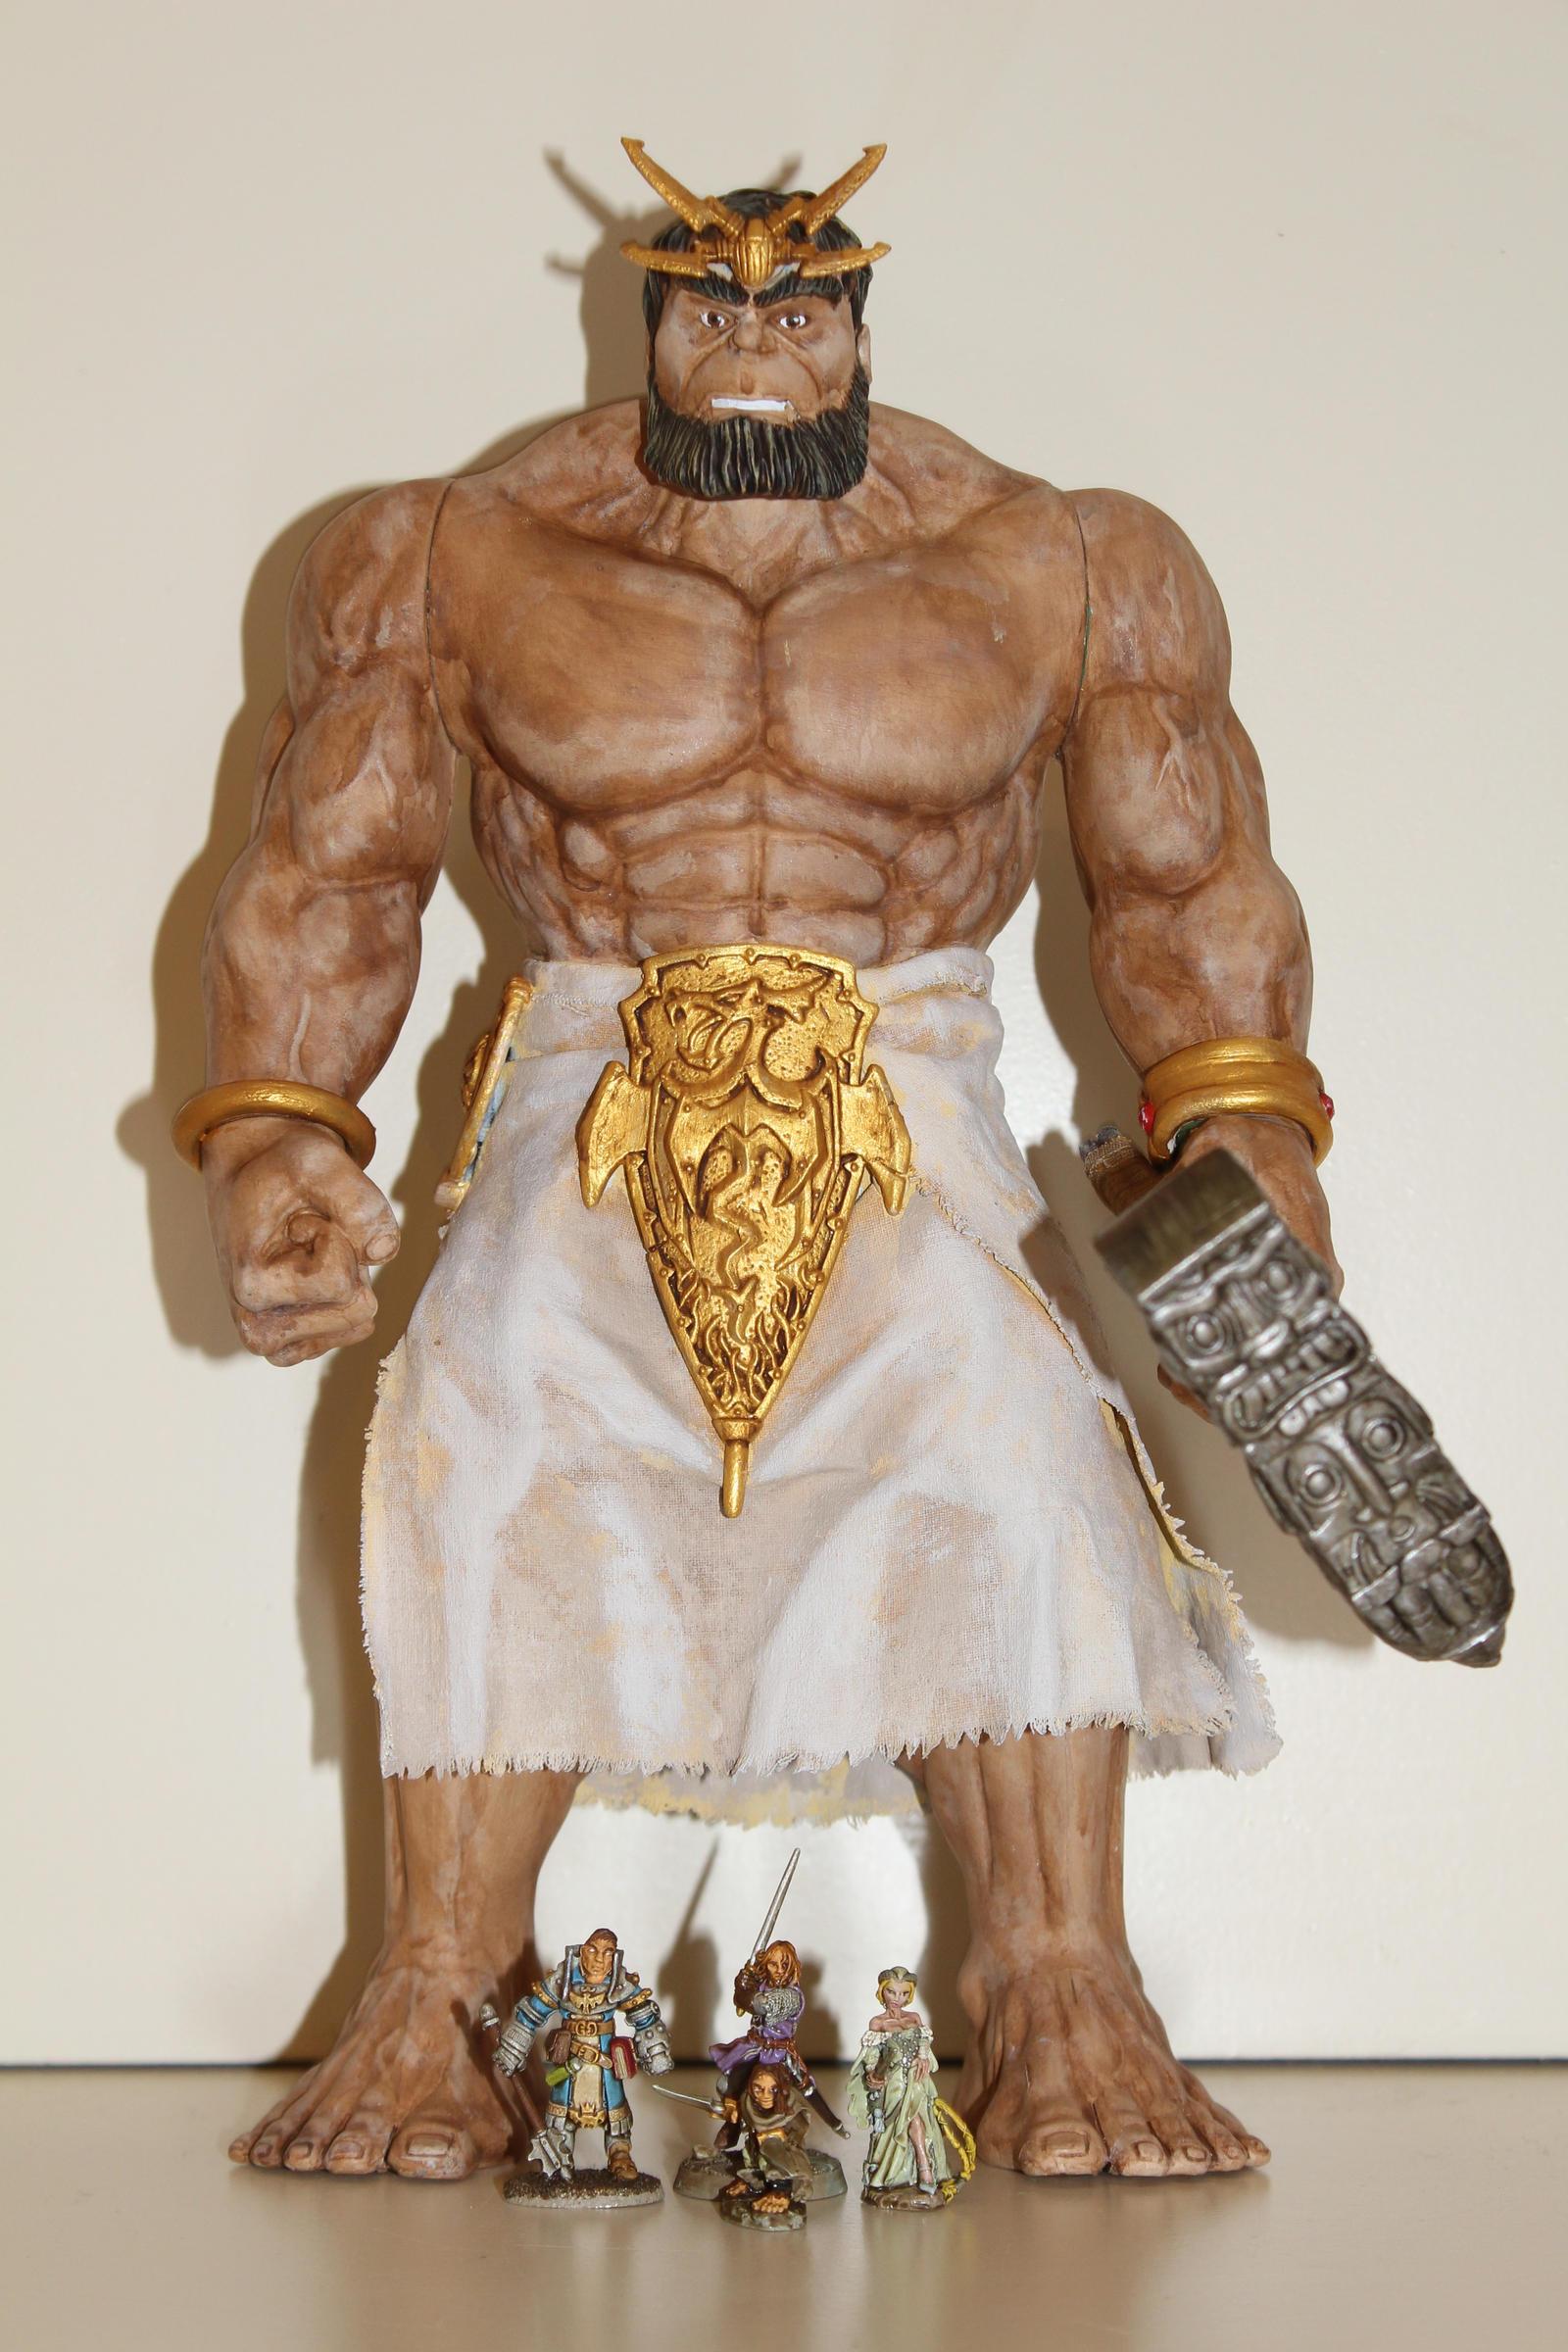 Classic titan size comparison by MrVergee